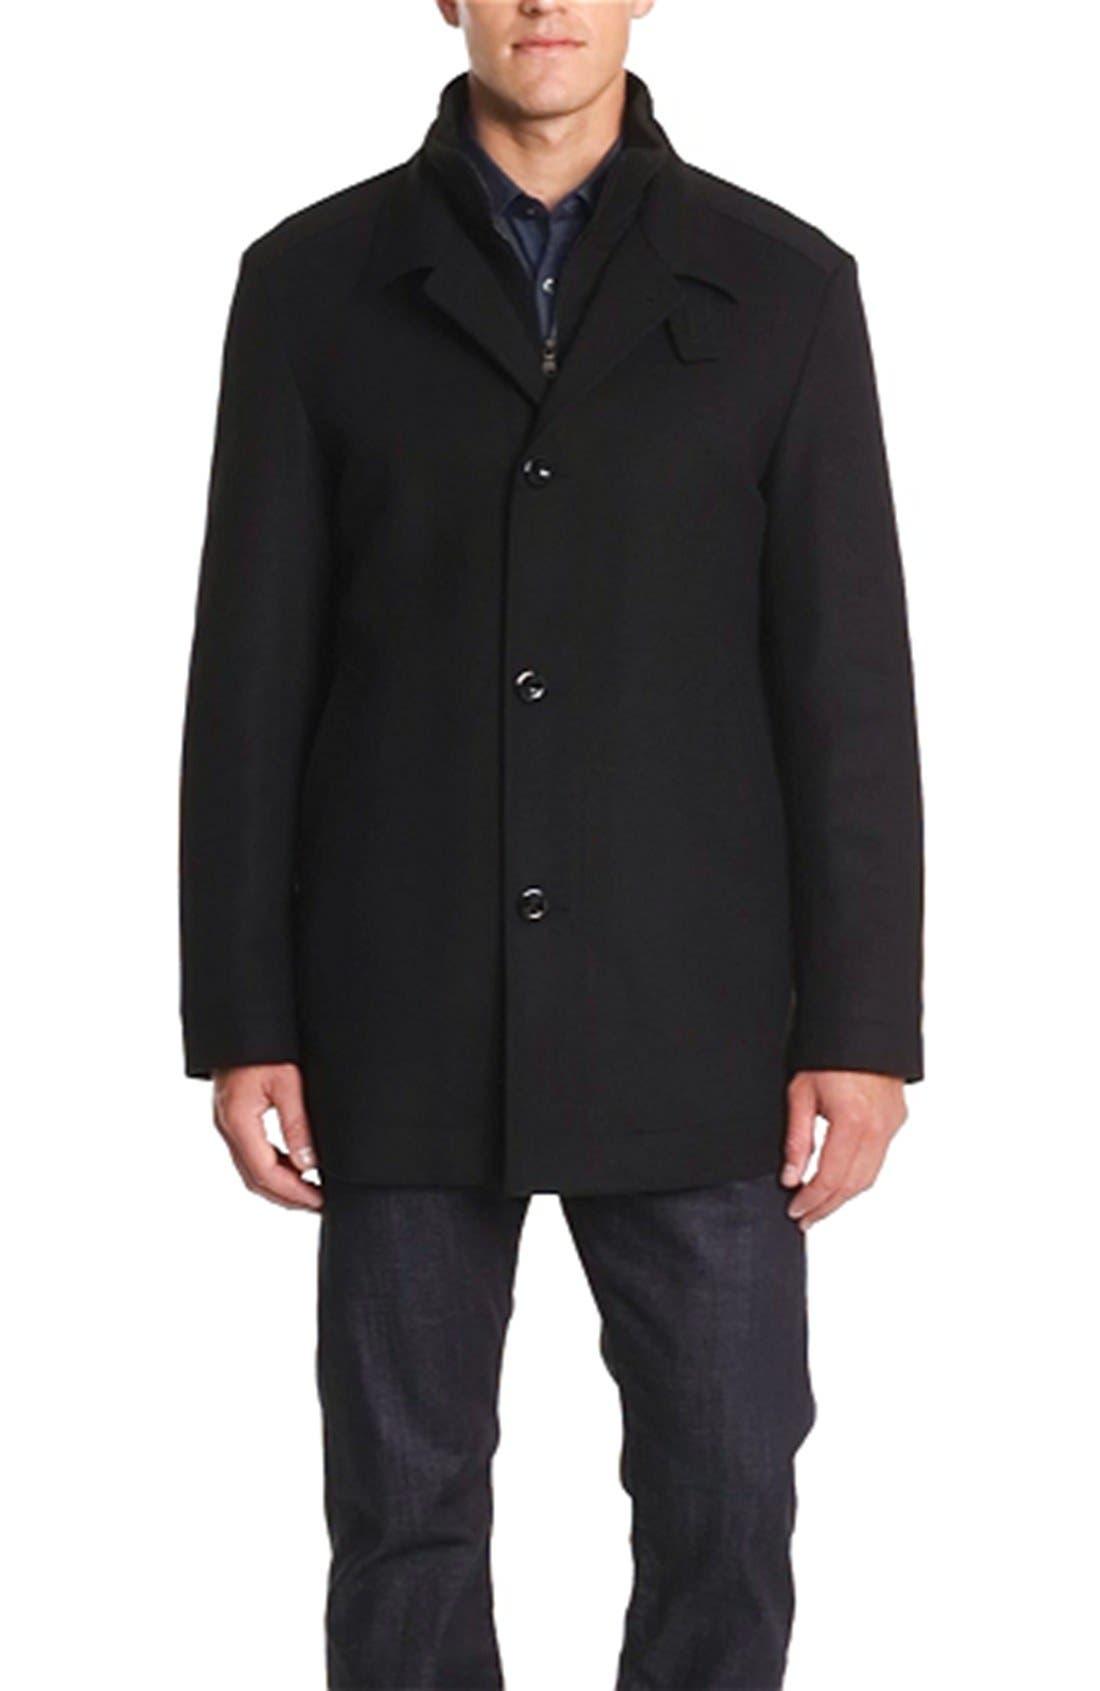 HUGO BOSS 'Coxtan' Wool & Cashmere Coat,                             Alternate thumbnail 4, color,                             001